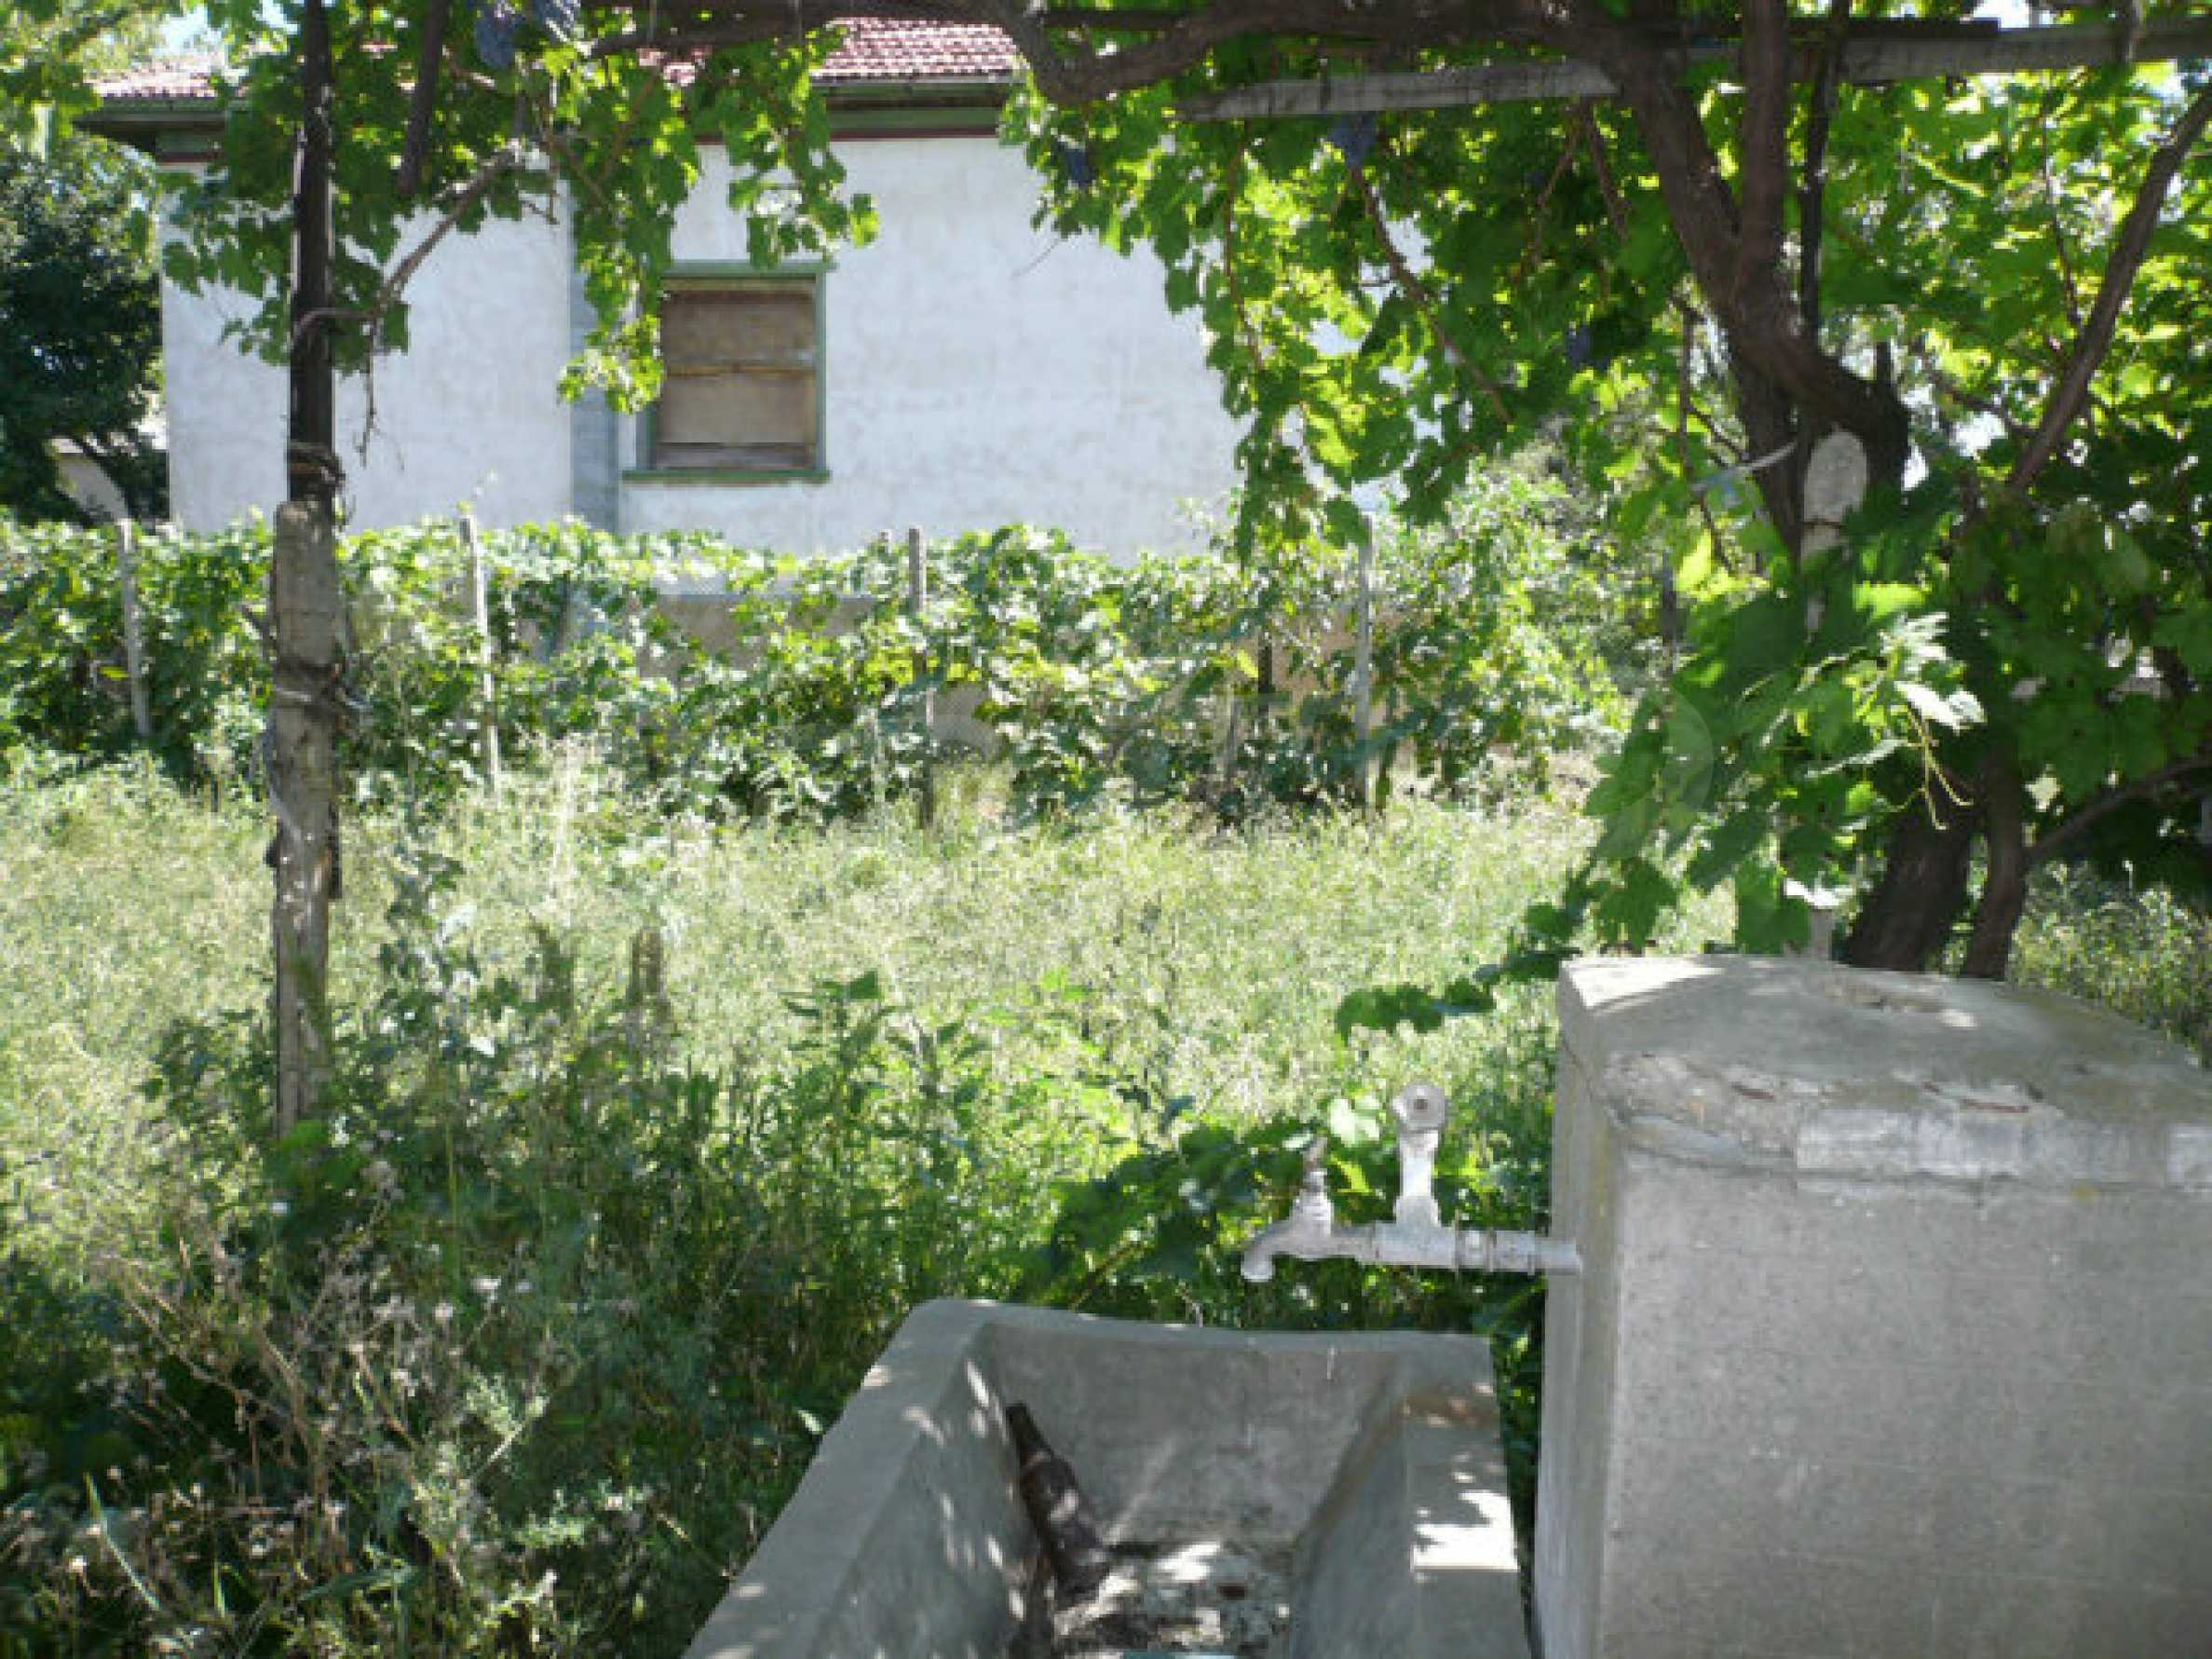 Big rural two-storey house on the Danube river near Vidin 3